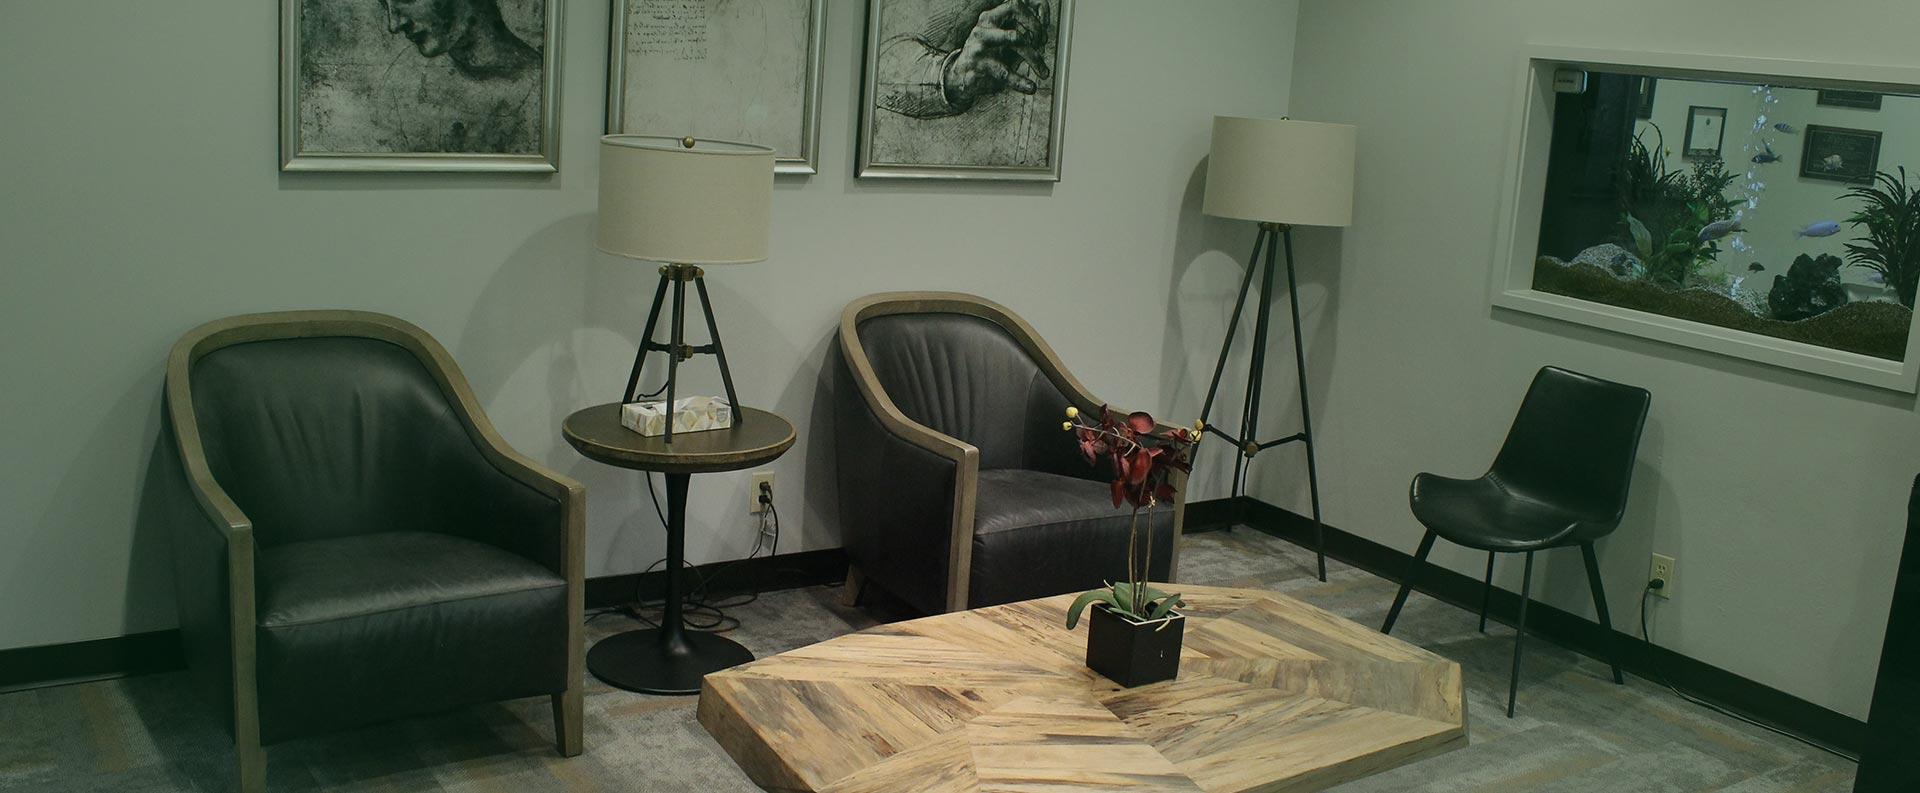 Waiting room of greenbelt dental